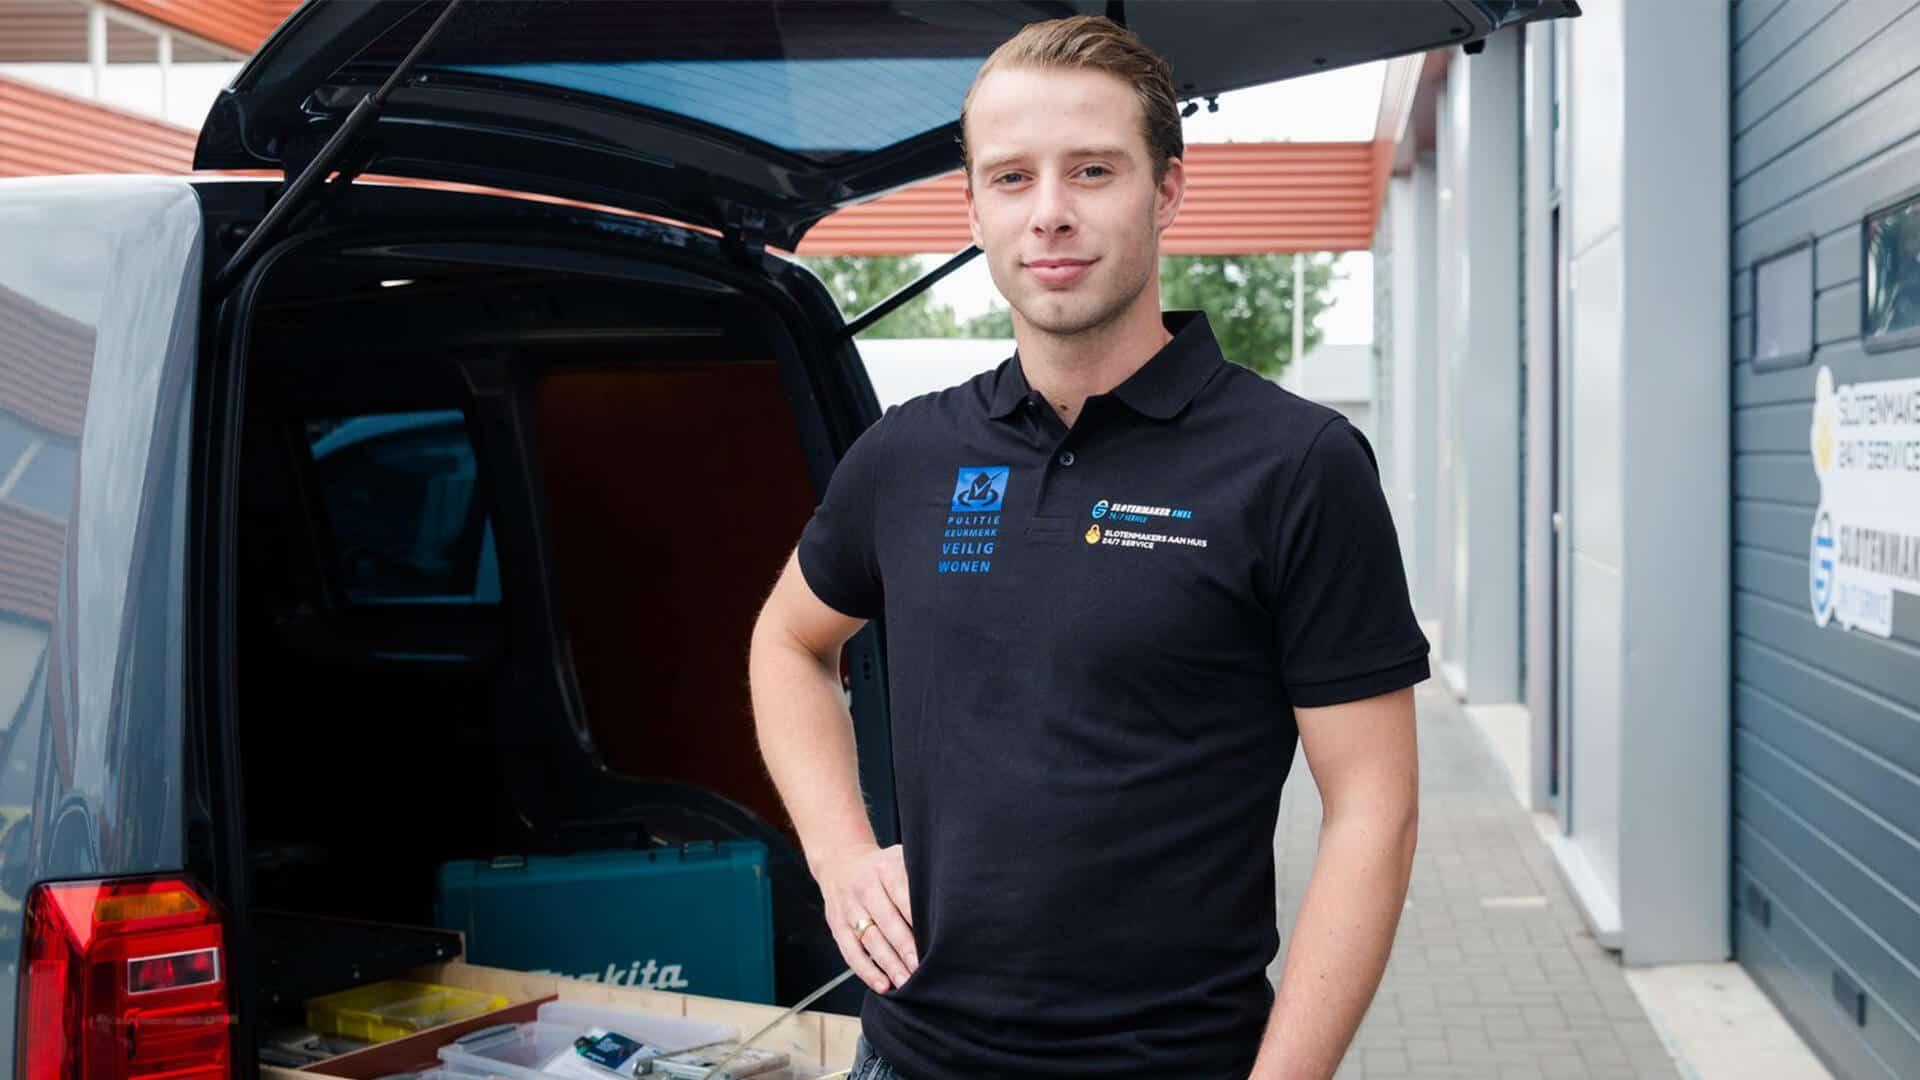 Slotenmaker Dalfsen